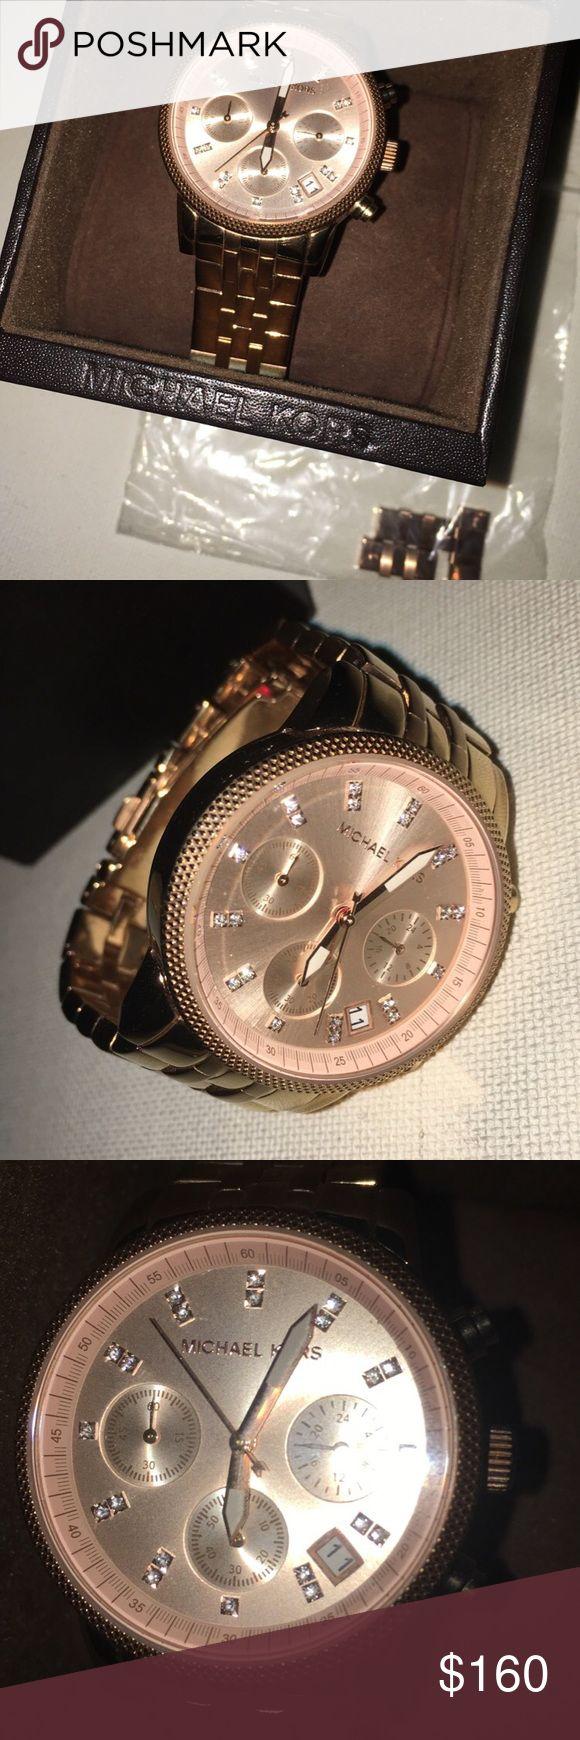 Michael Kors Watch Rose gold mk watch Michael Kors Accessories Watches